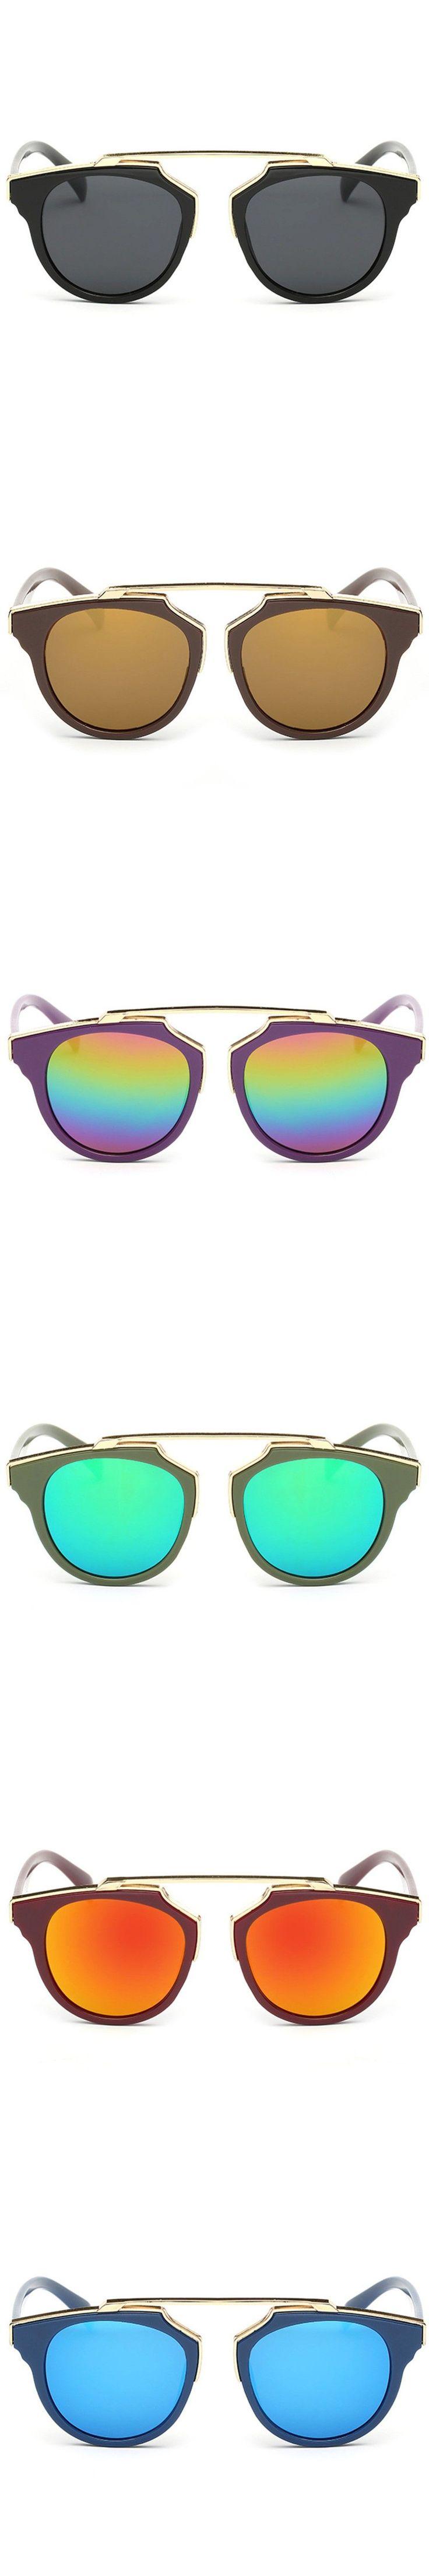 HOT Brand New Design 2016 Summer Vintage Kids Sunglasses Children Oversized Steampunk Sun Glasses Eyewear gafas de sol mujer Z2